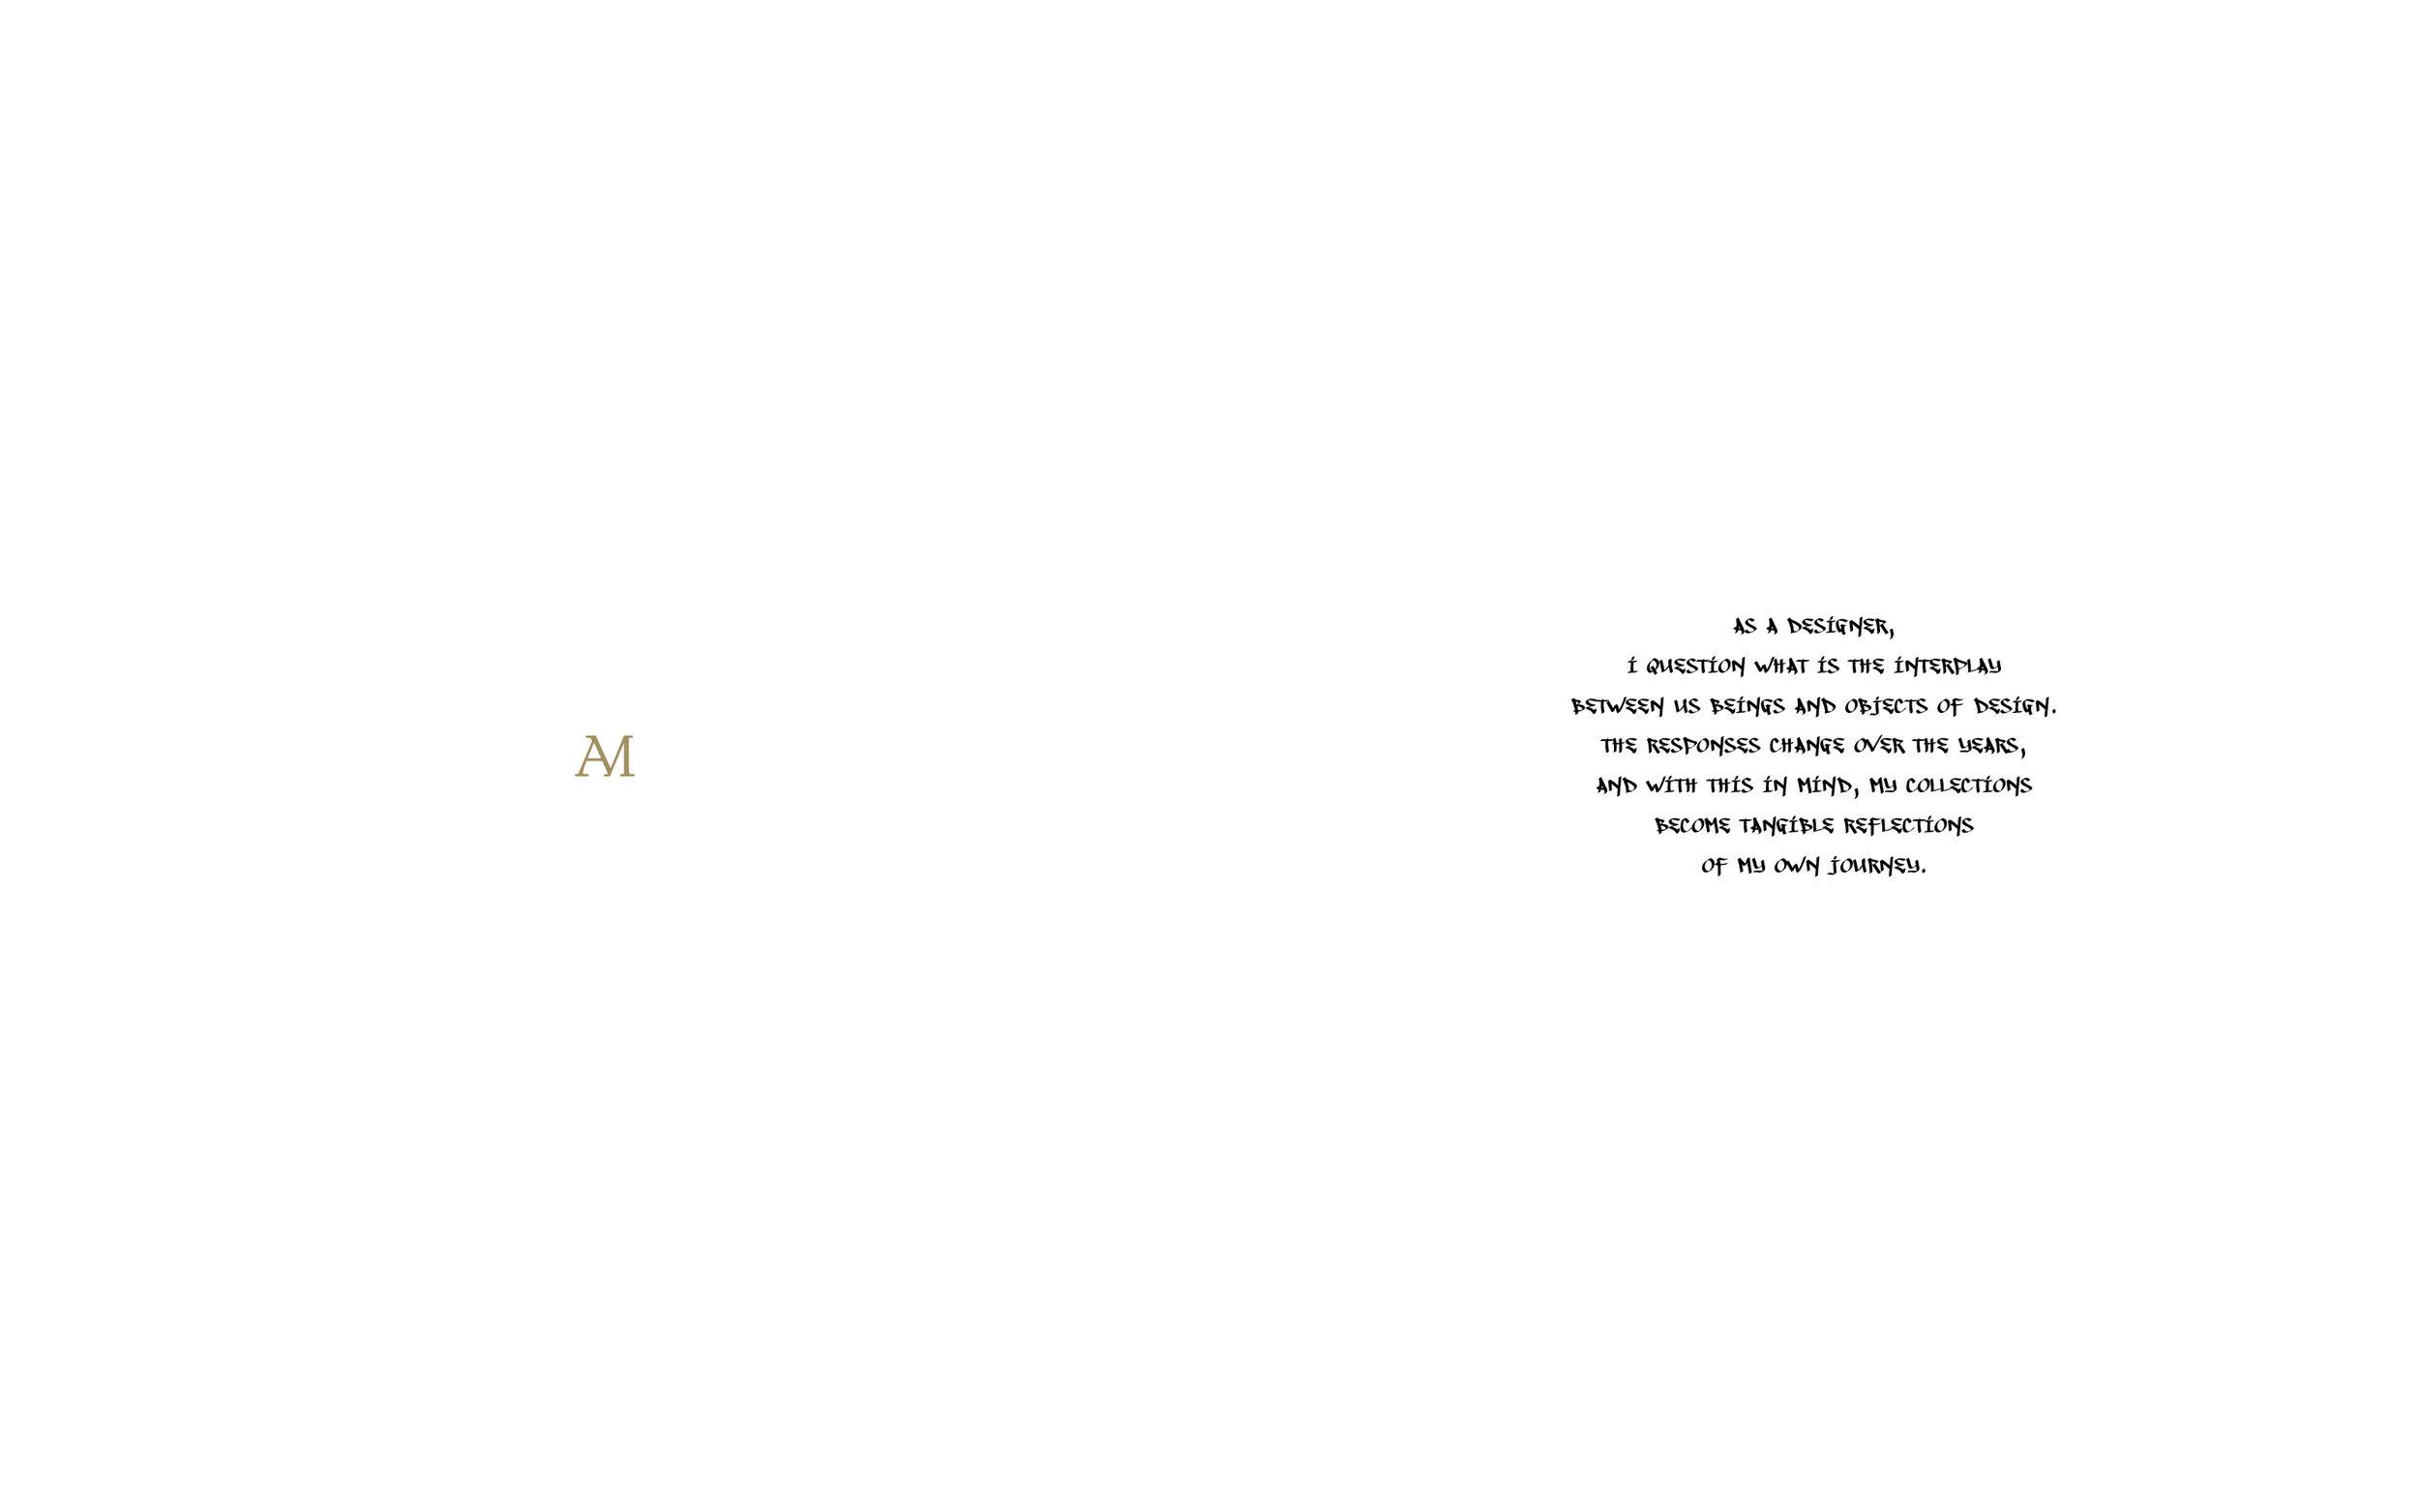 AM_COLLECTORS_GUIDE NO. 5 03.12.1861.jpg